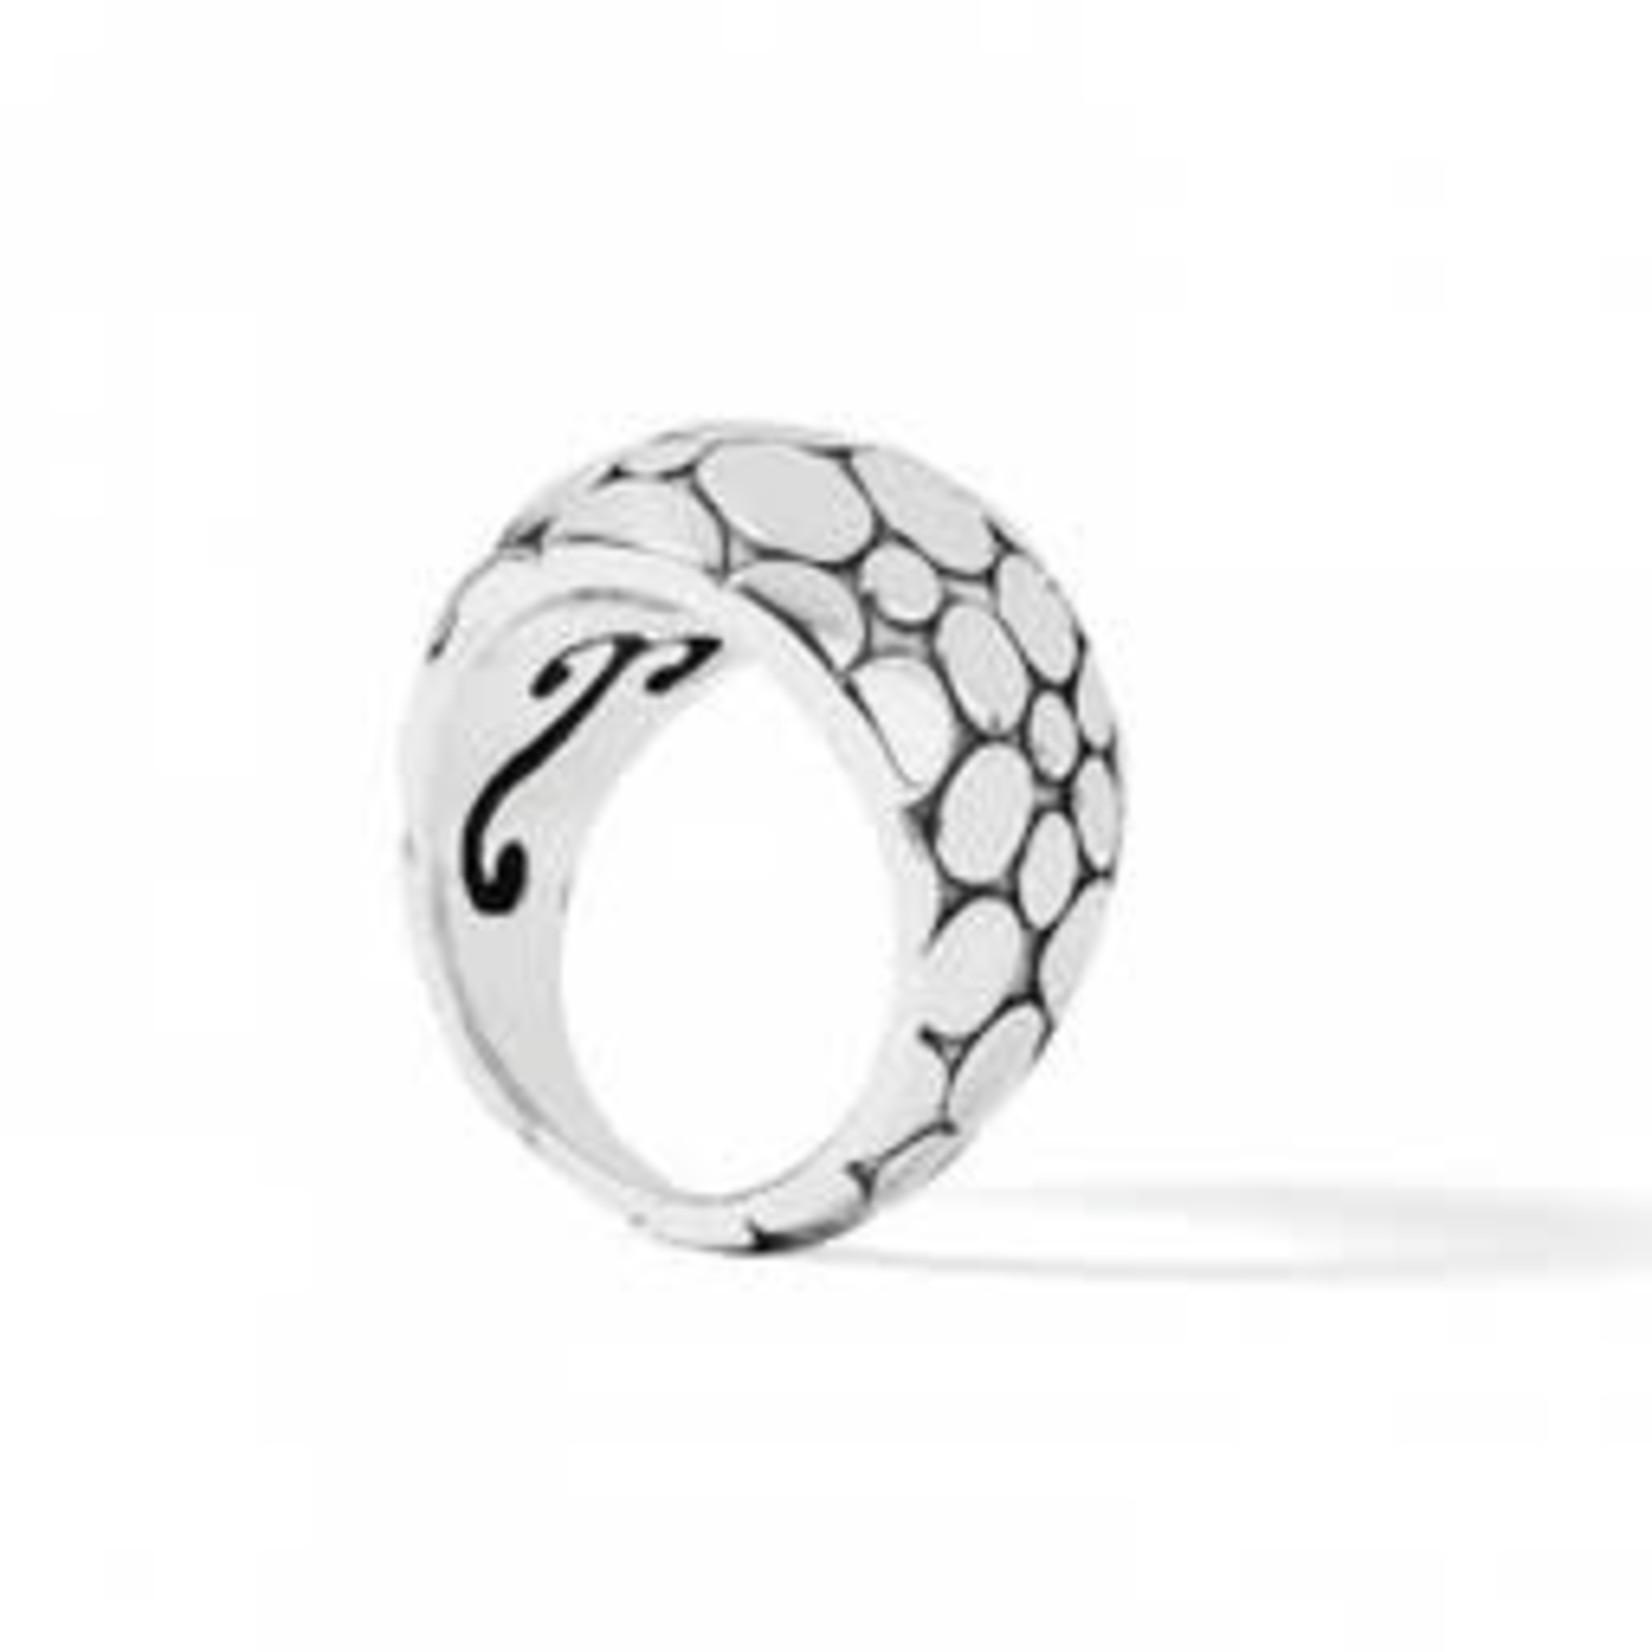 Brighton Pebble Ring in Silver Sz 8